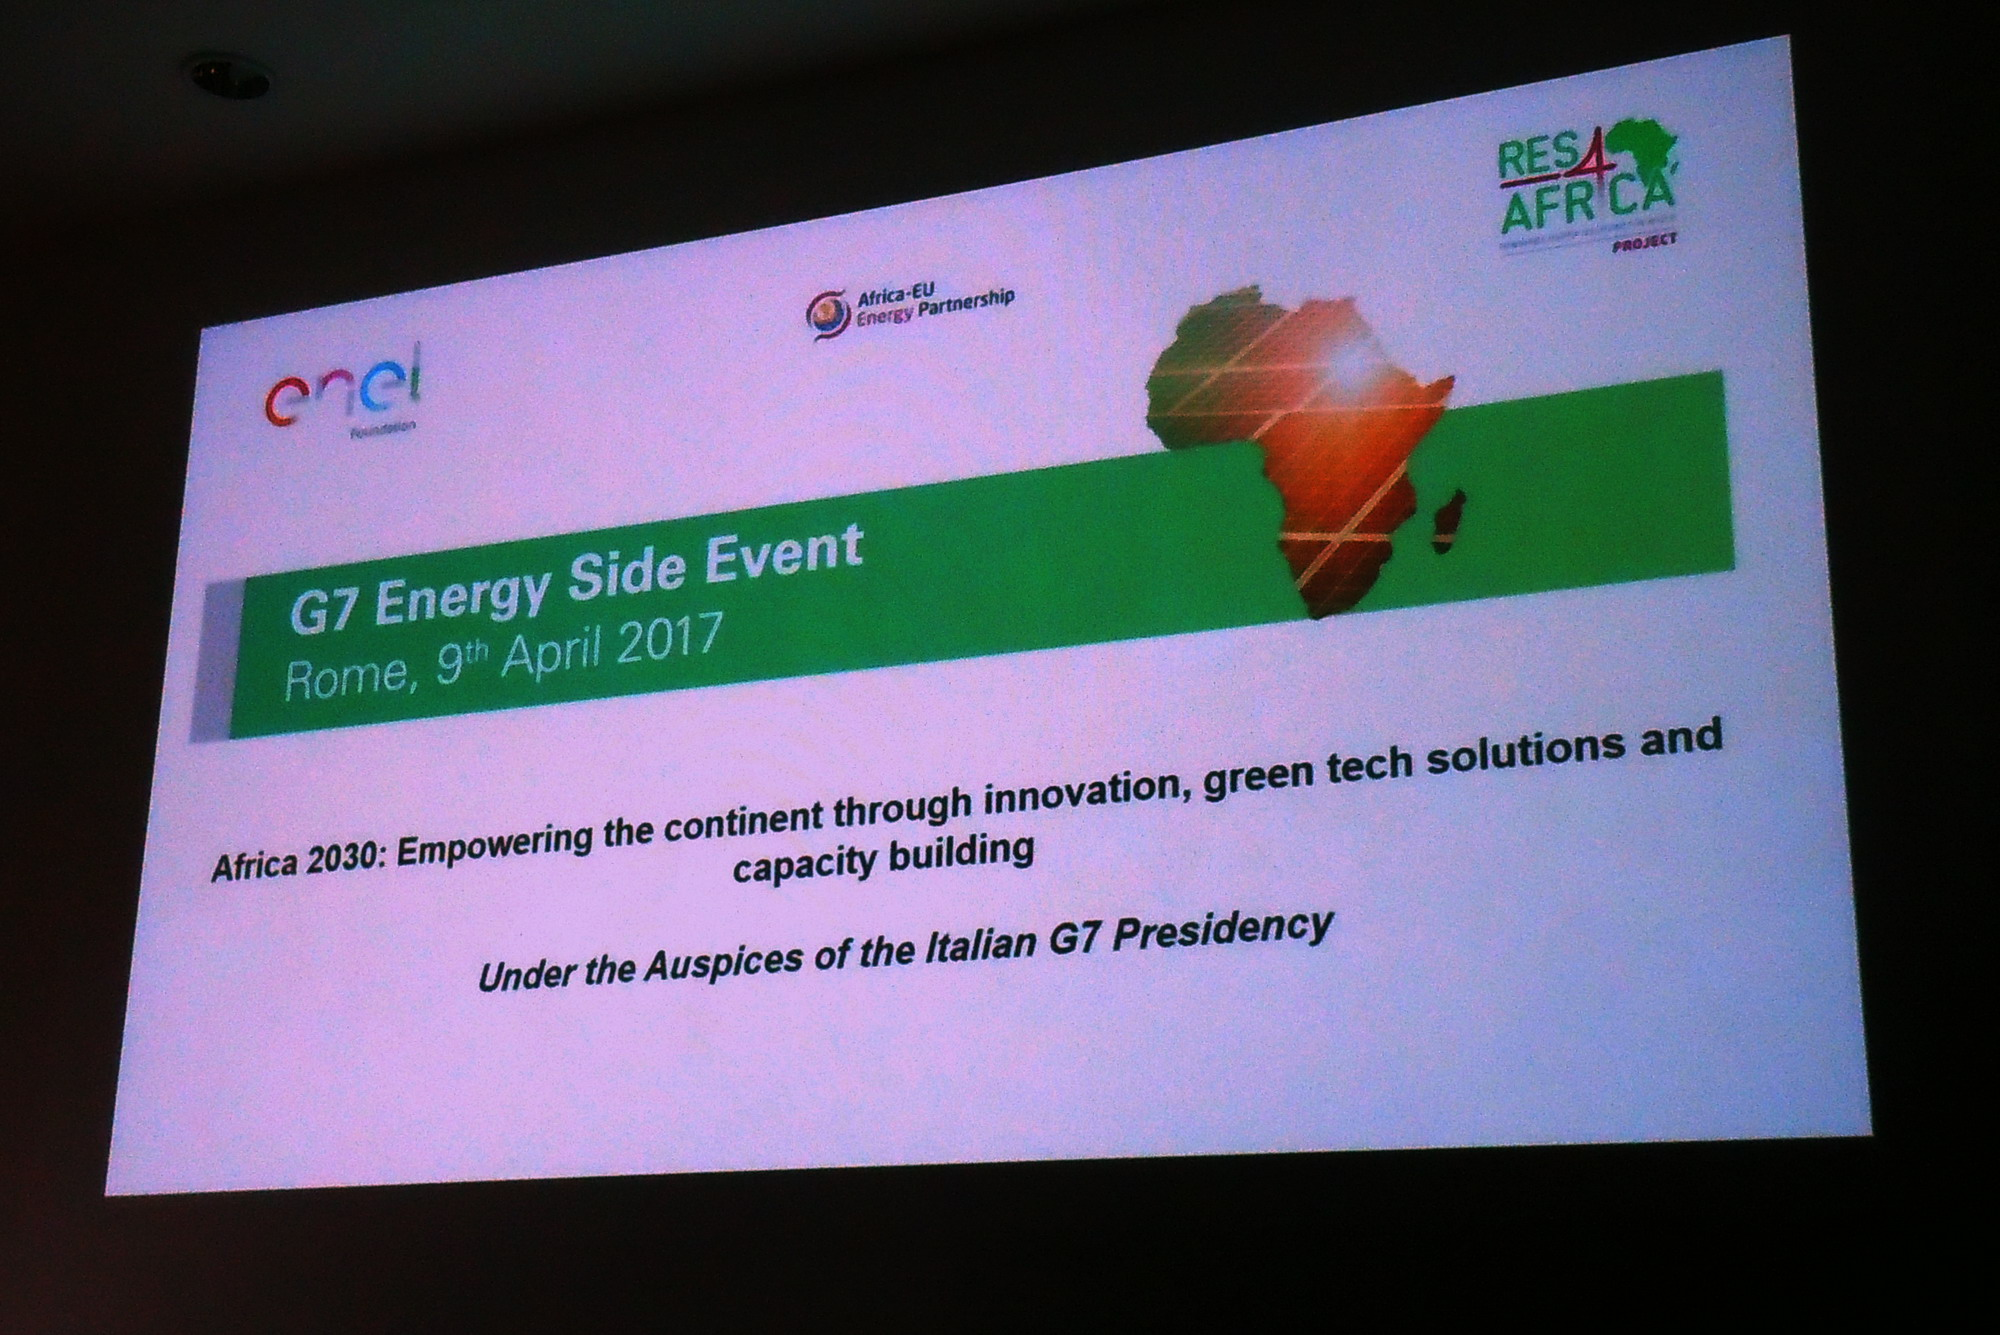 G7 Energy Africa